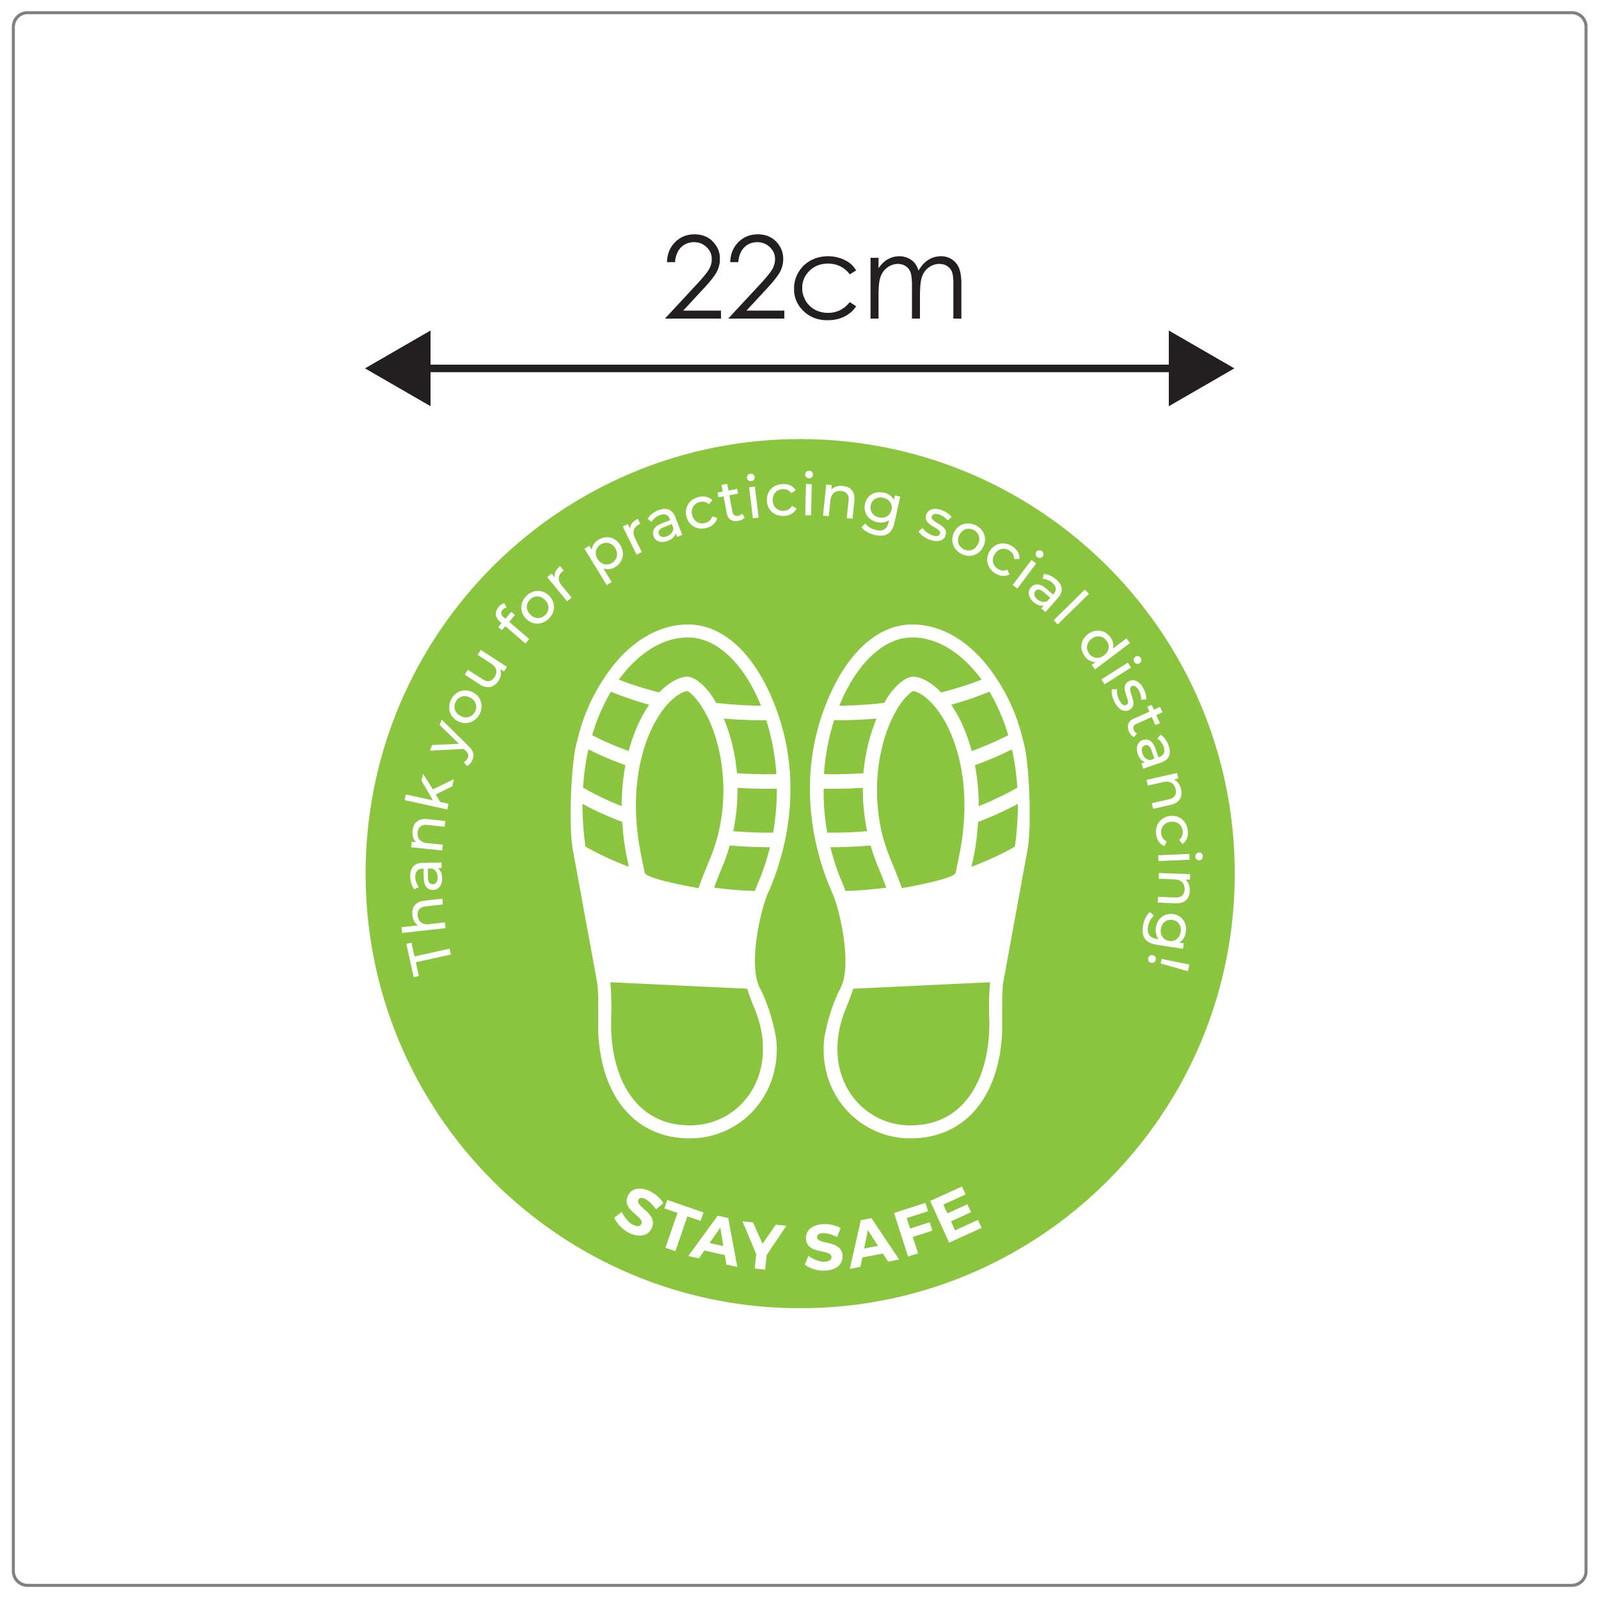 social distancing floor sticker for outdoor floors, sizing Self-adhesive Corona virus floor sticker to help social distancing.